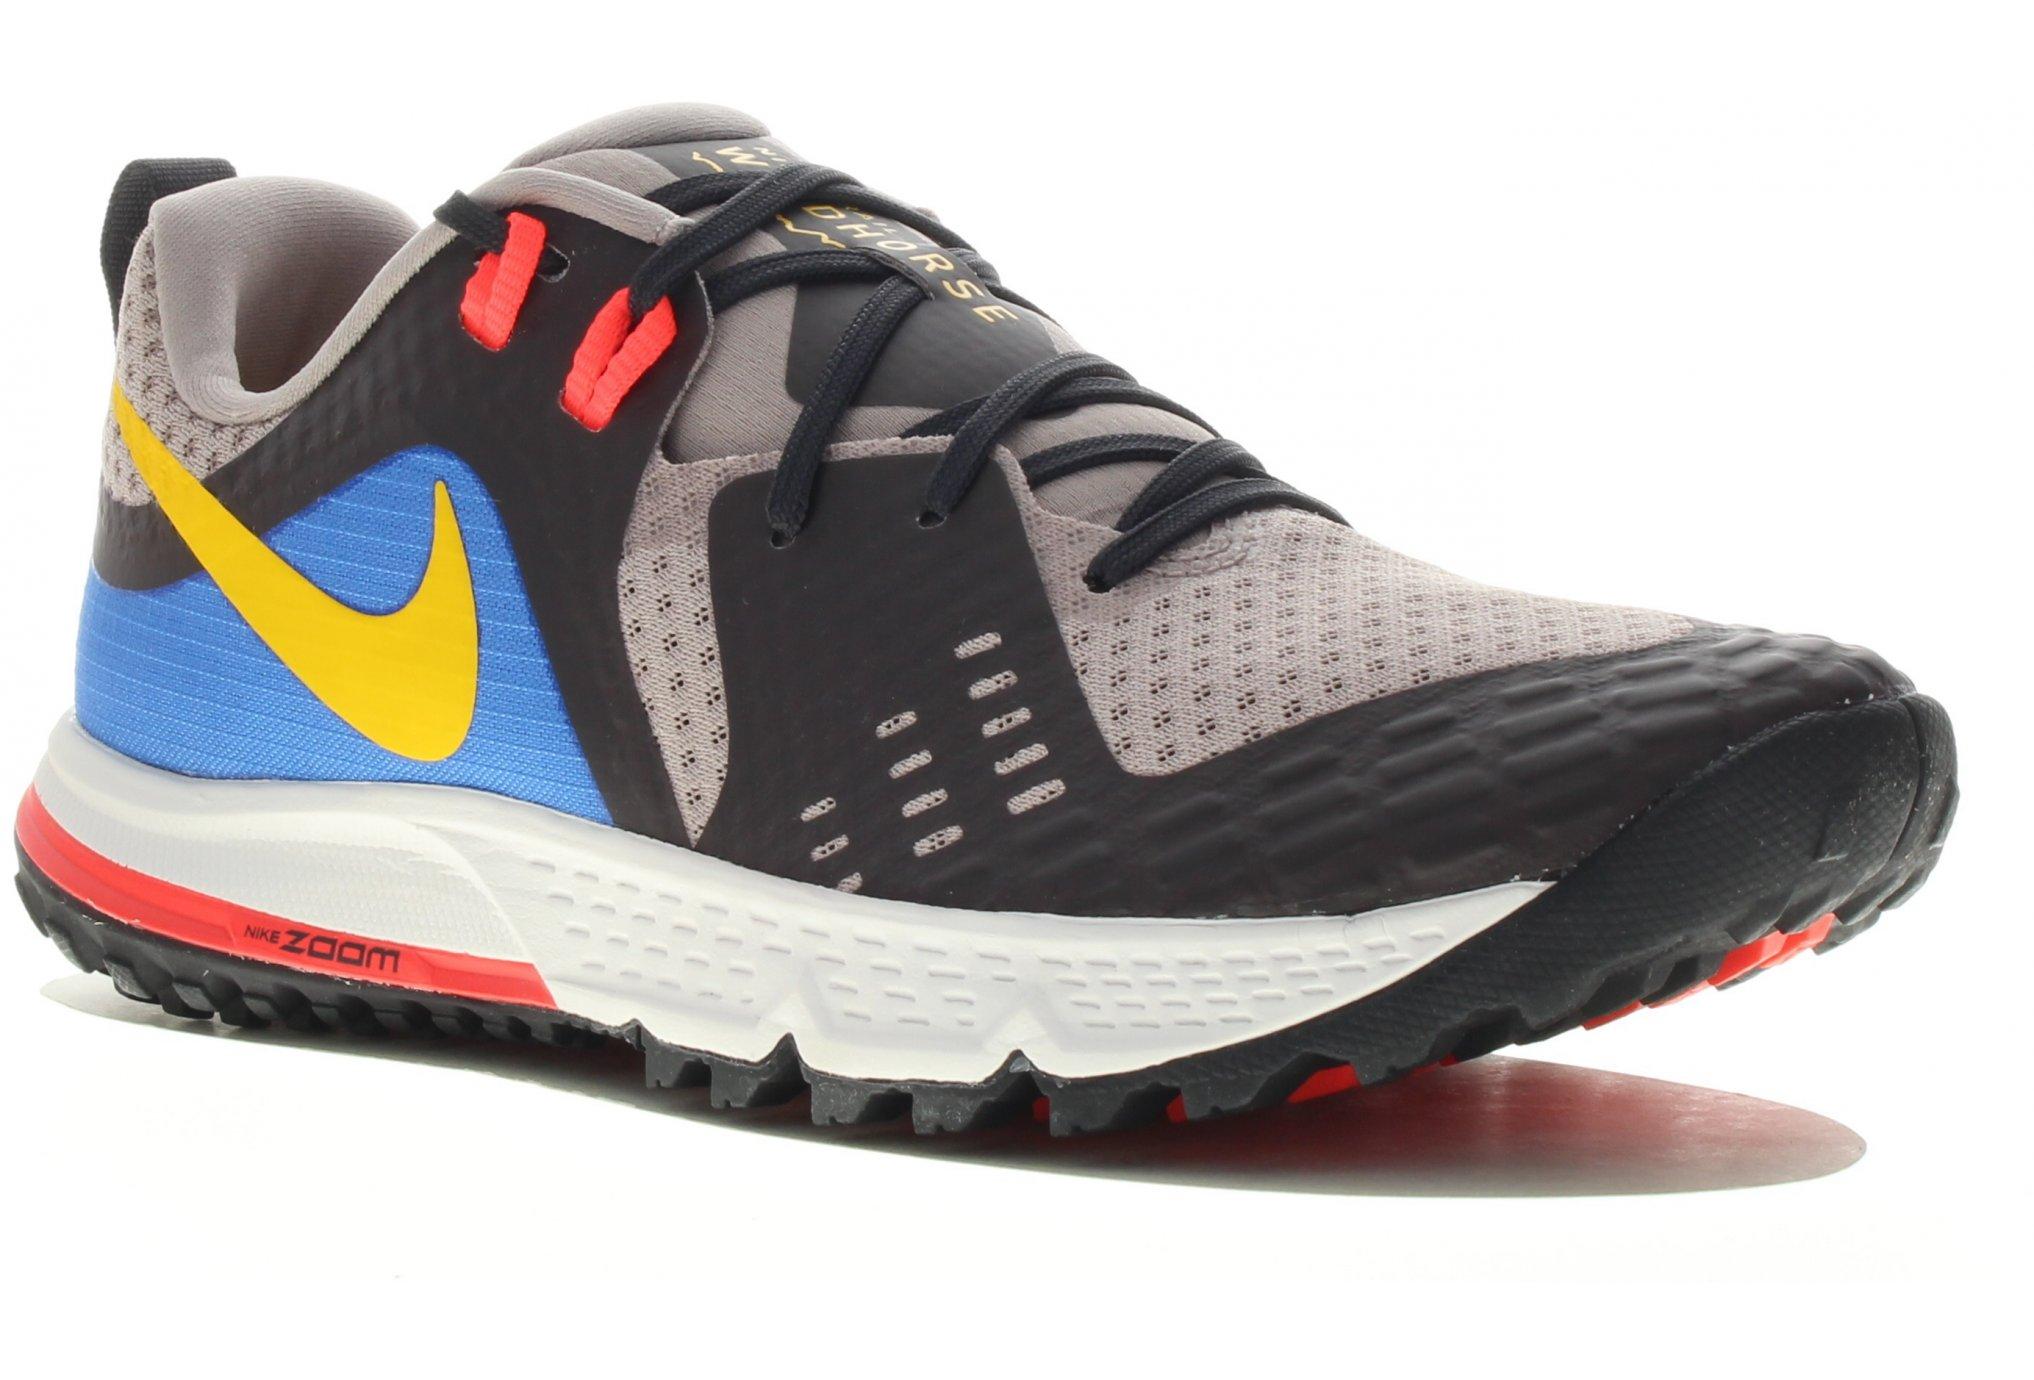 Nike Air Zoom Wildhorse 5 W Diététique Chaussures femme